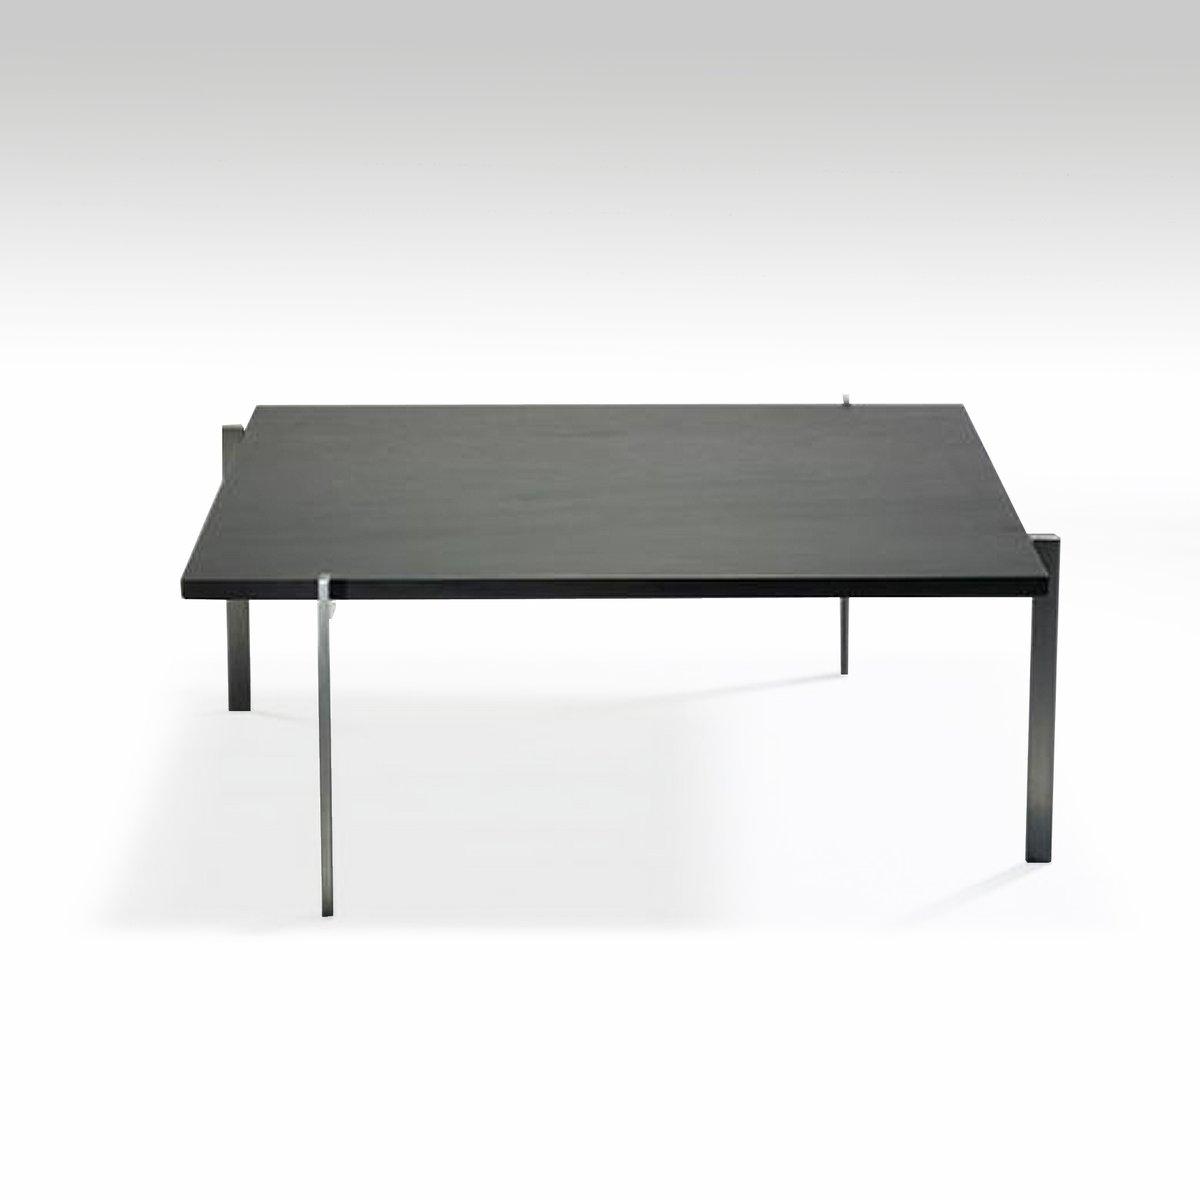 table basse pk61 en ardoise par poul kjaerholm pour e kold christensen en vente sur pamono. Black Bedroom Furniture Sets. Home Design Ideas